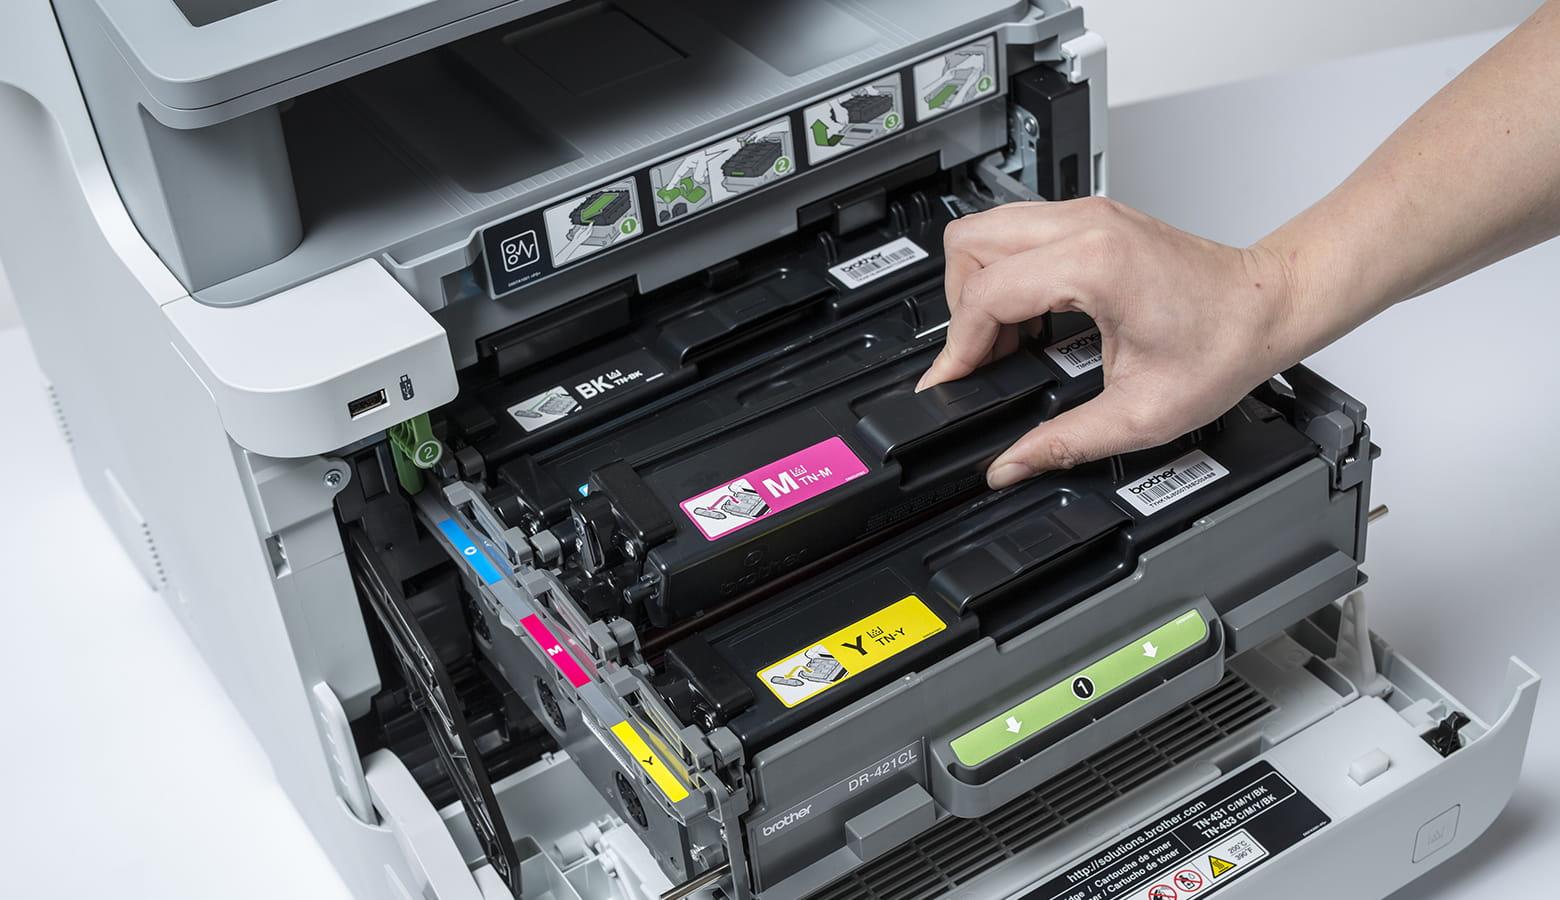 Cassetto toner stampante Brother MFC-L9570CDW risparmio energetico